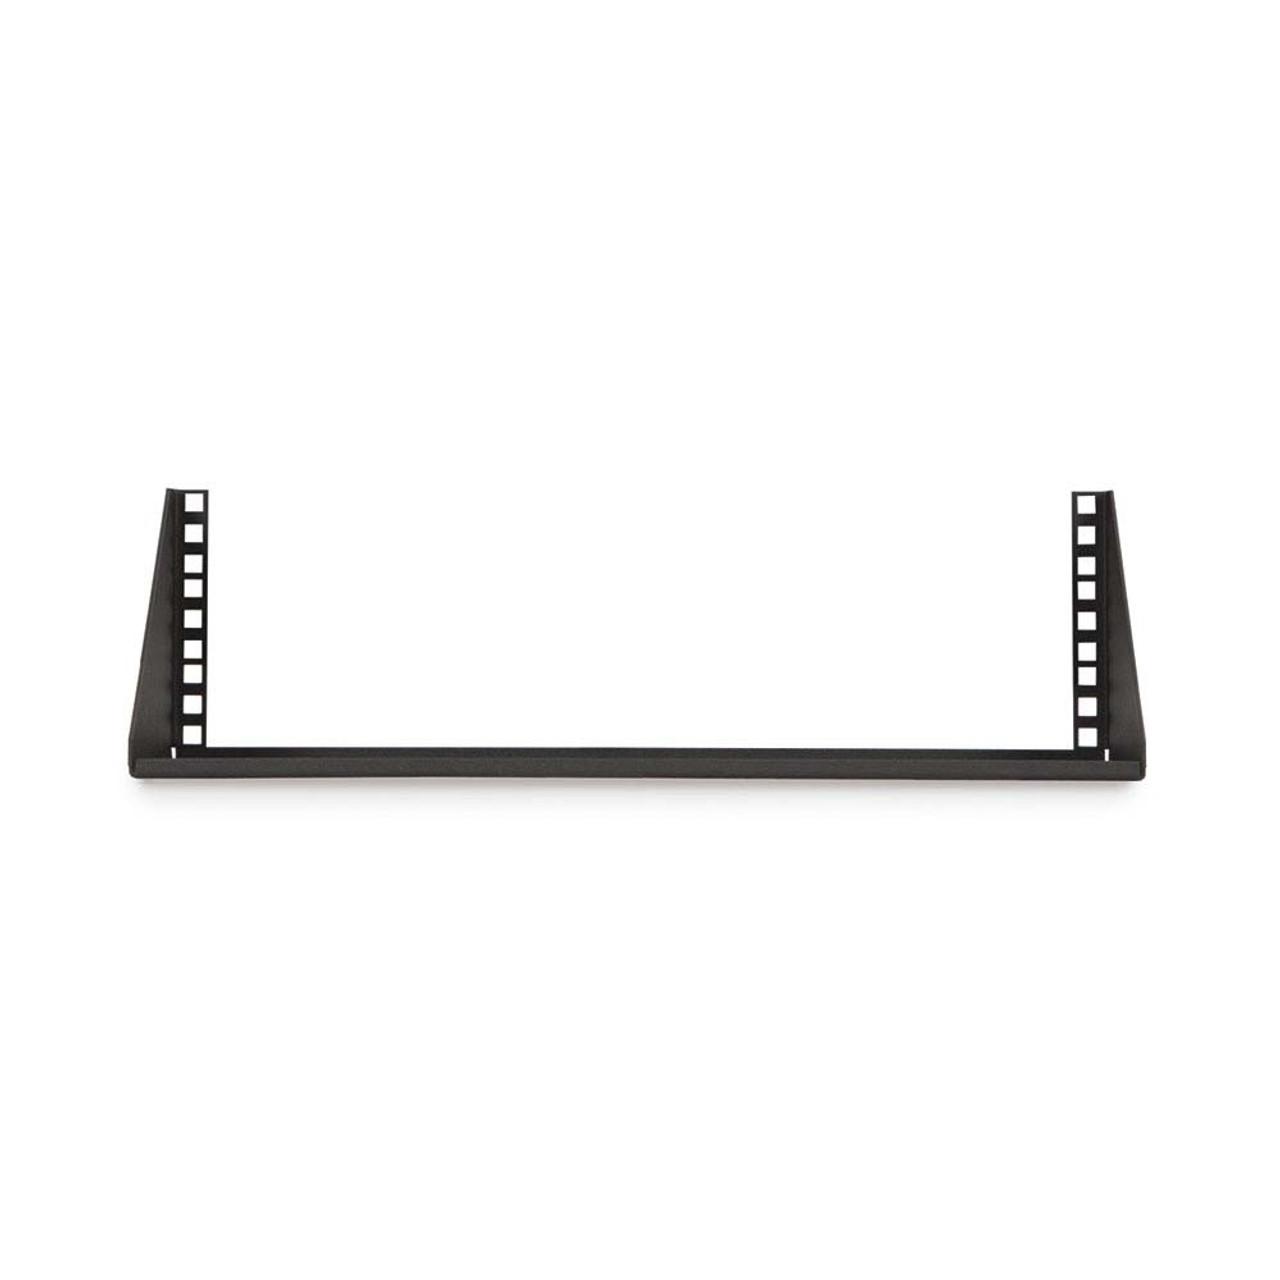 Buy Computer Rack Wall Mounted Cabinets Usa